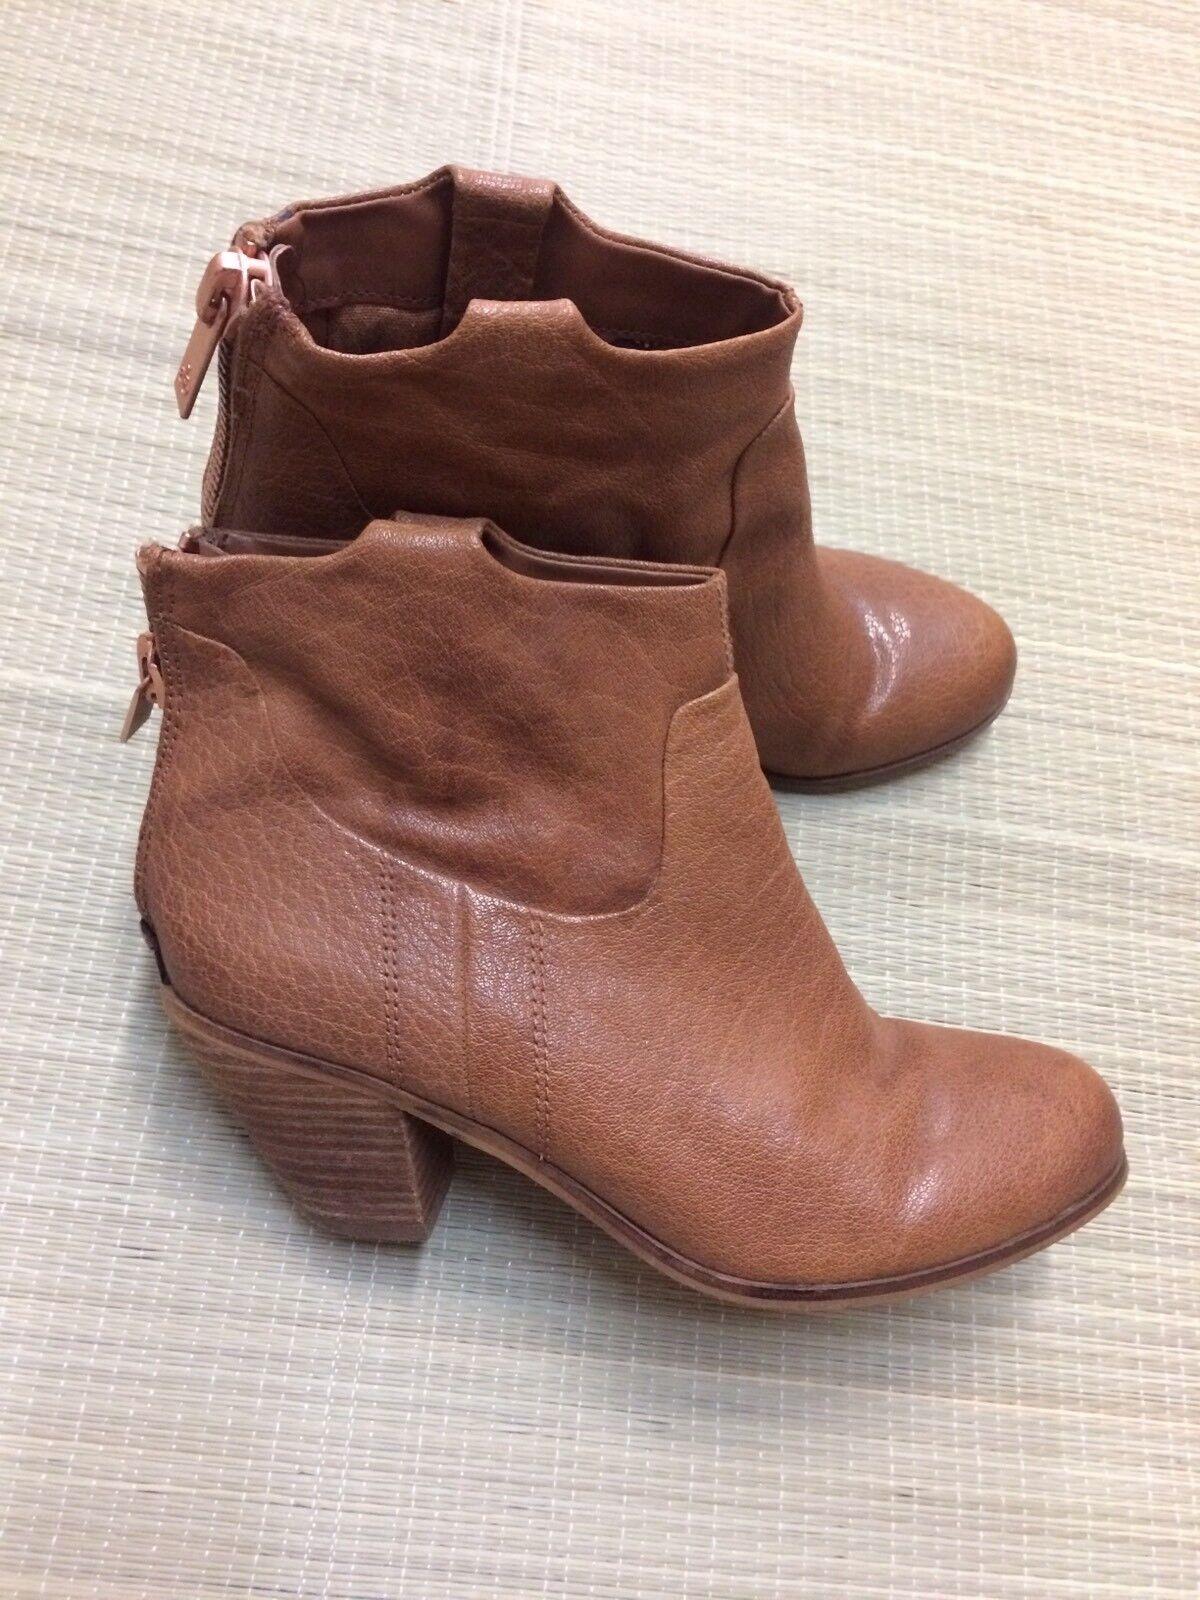 Sam Edelman Lisle Leather Ankle Boots Size 7.5 EUC